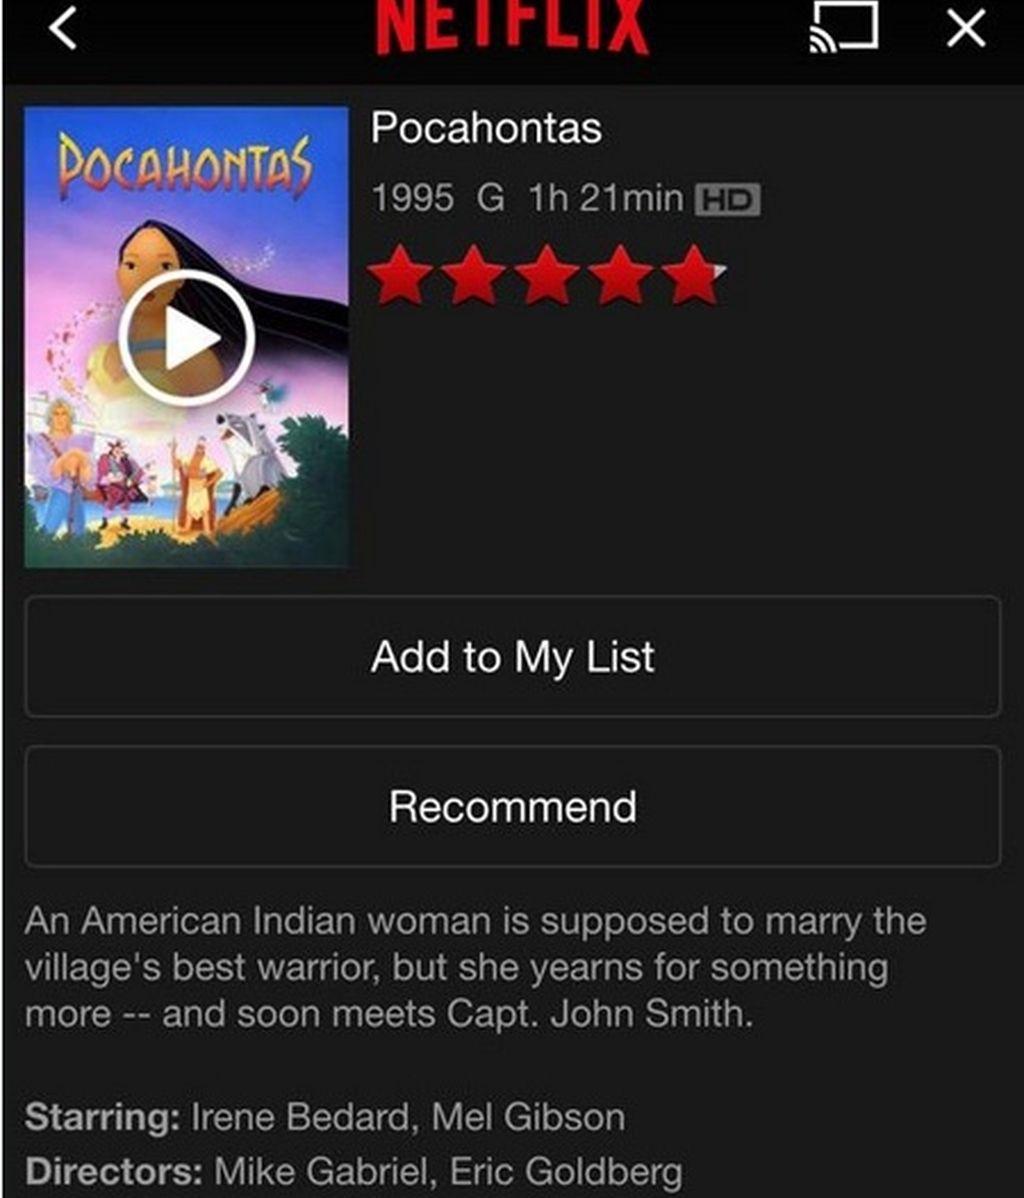 Pocahontas sinopsis